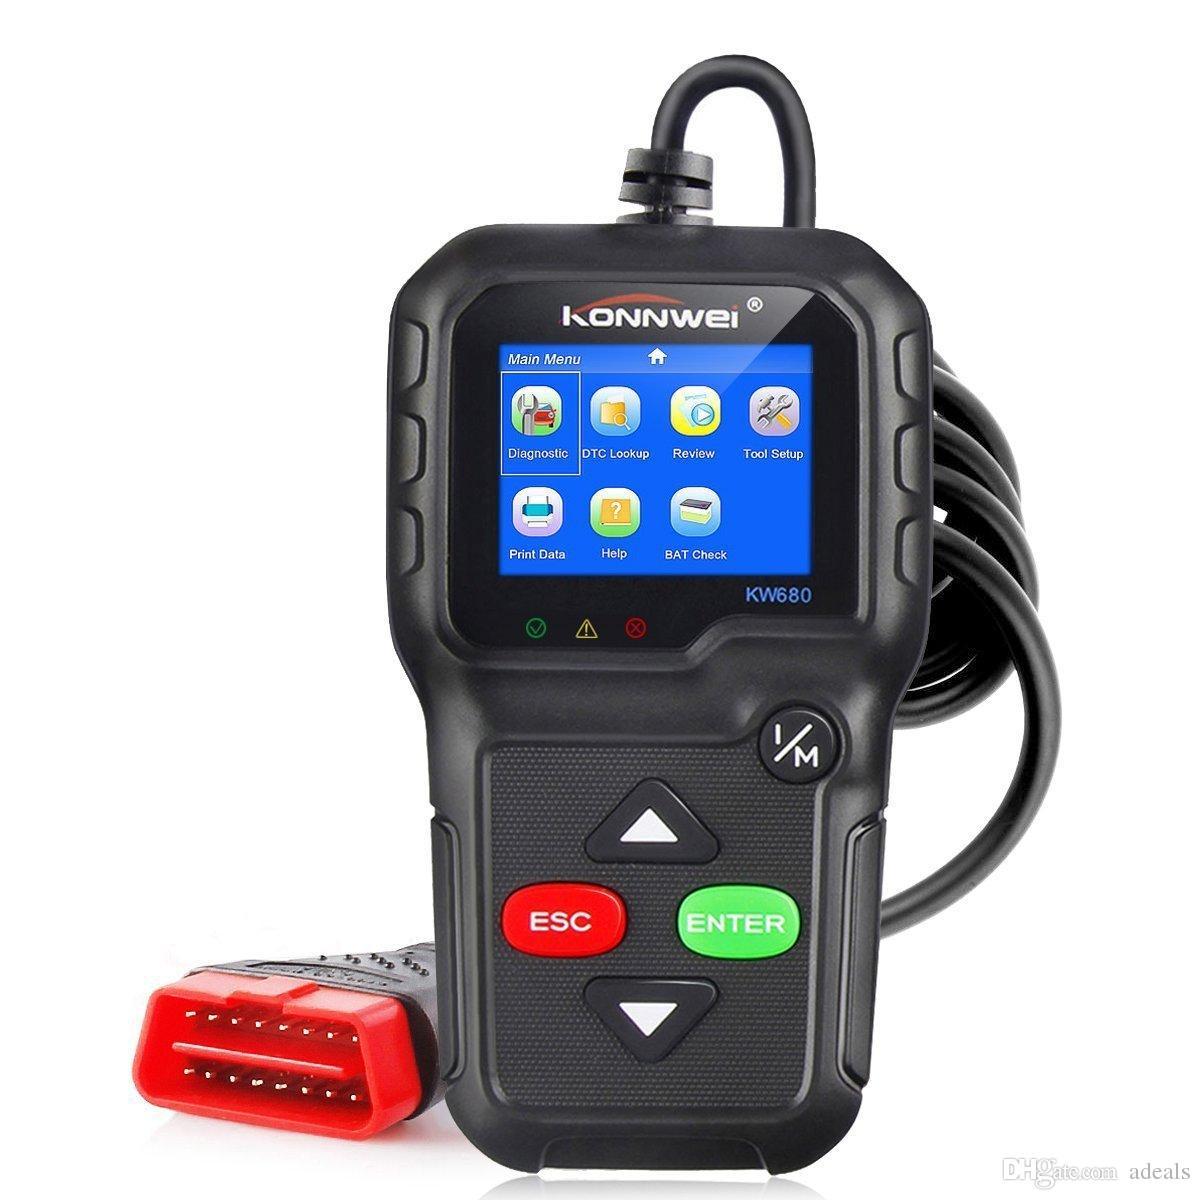 Automotive Scan Tool >> 2019 Obd 2 Odb 2 Automotive Scanner Kw680 Full Obd2 Function Odb 2